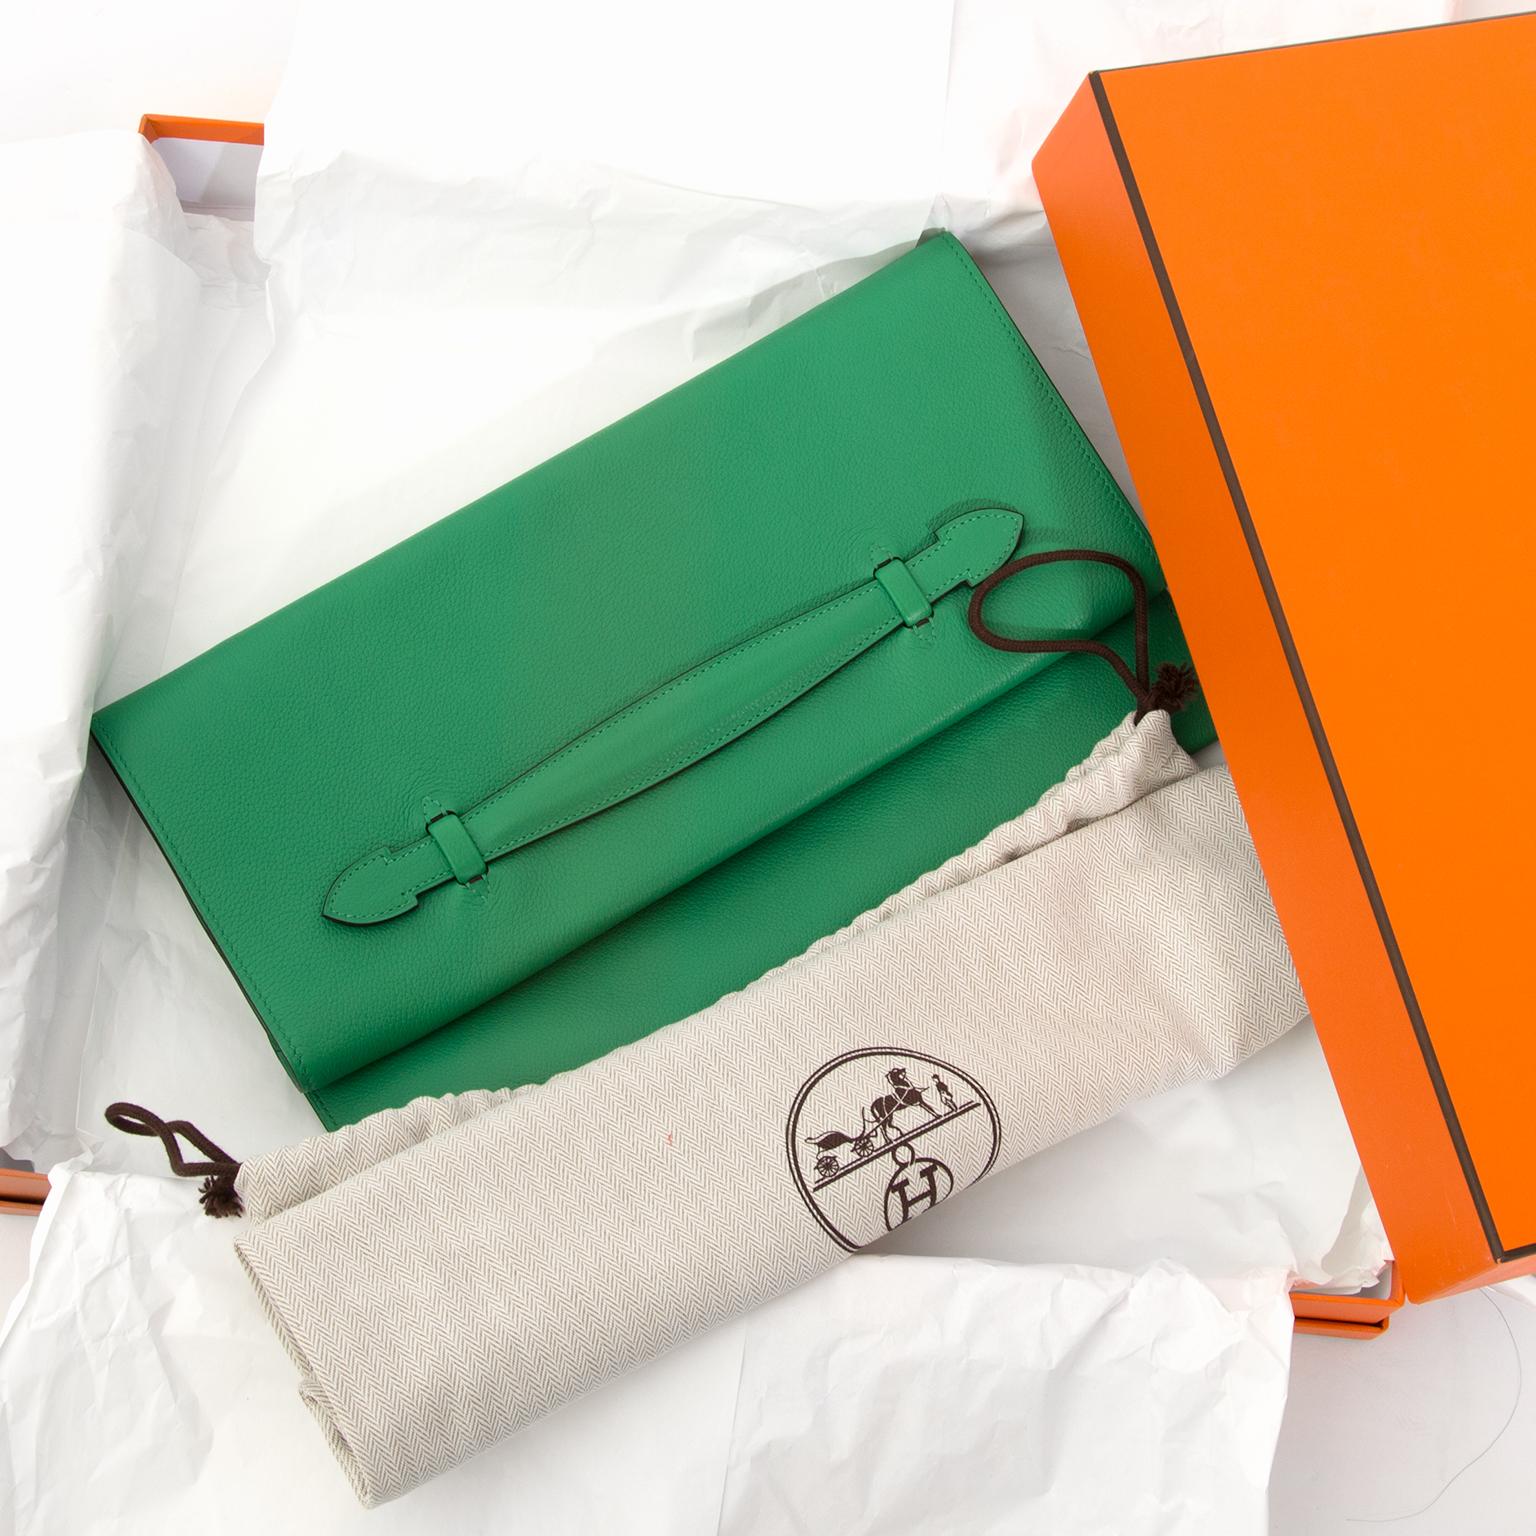 Hermes PliPlat Clutch Vind tweedehands Hermes Clutches bij LabelLOV vintage webshop.